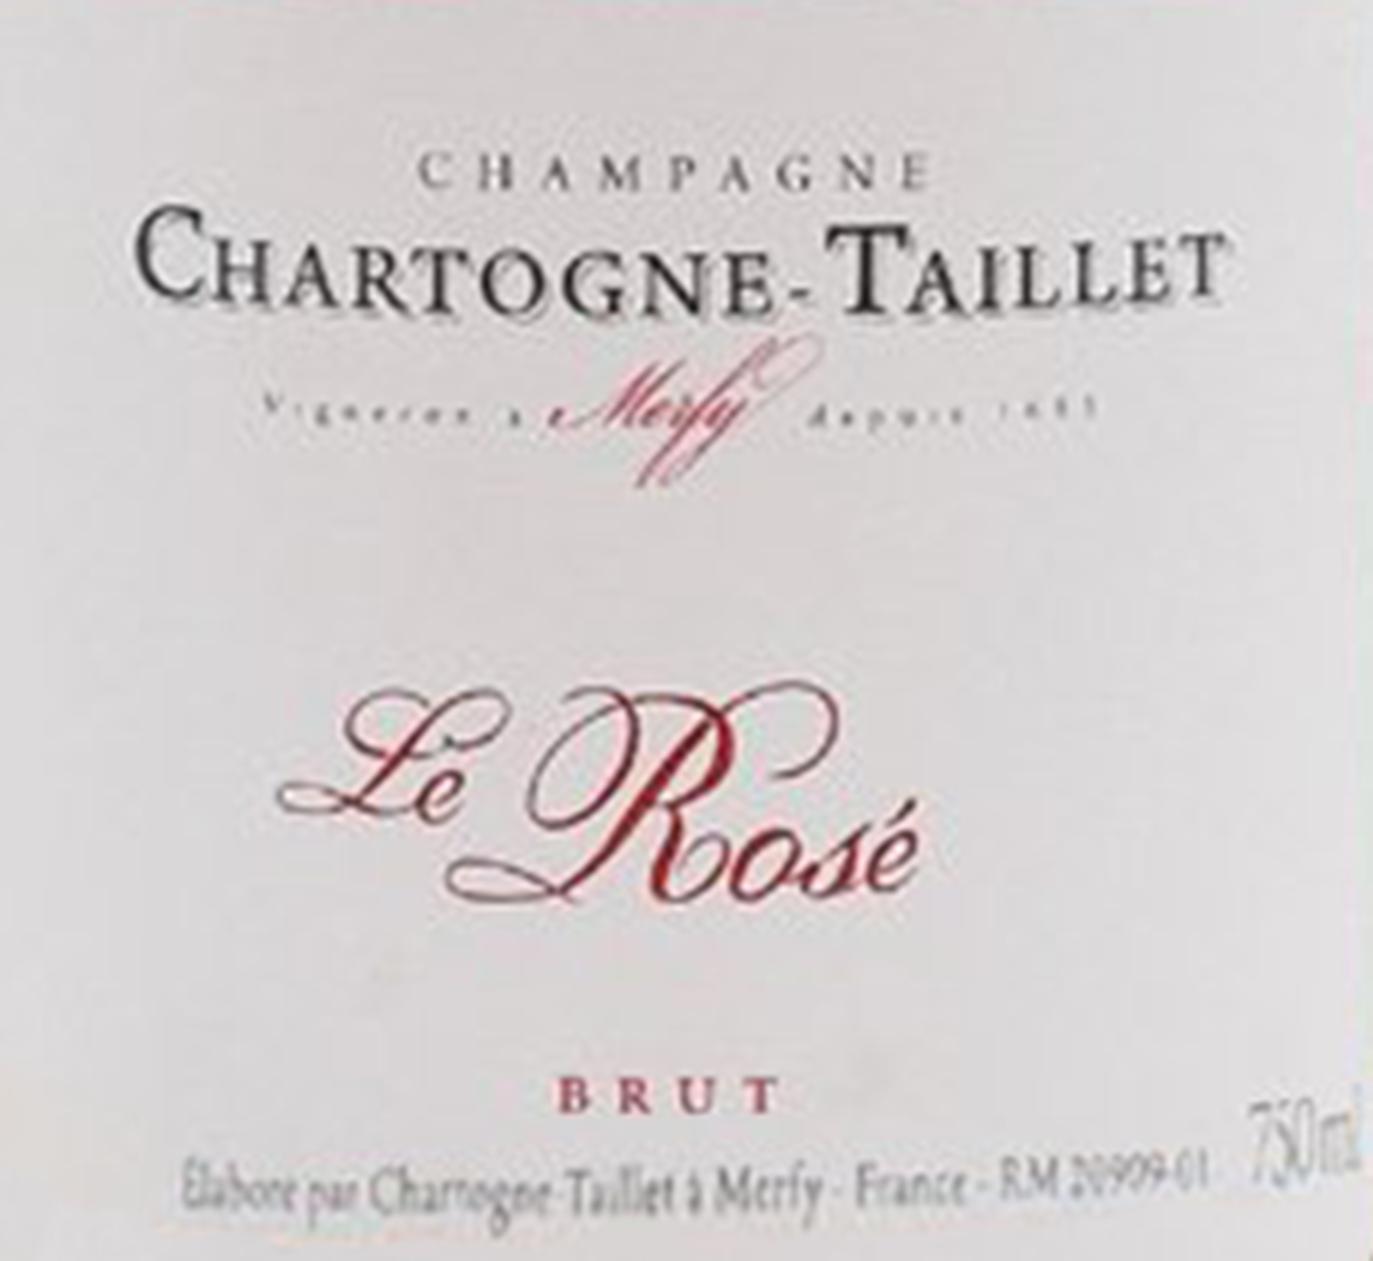 Chartogne Taillet Le Rose Brut